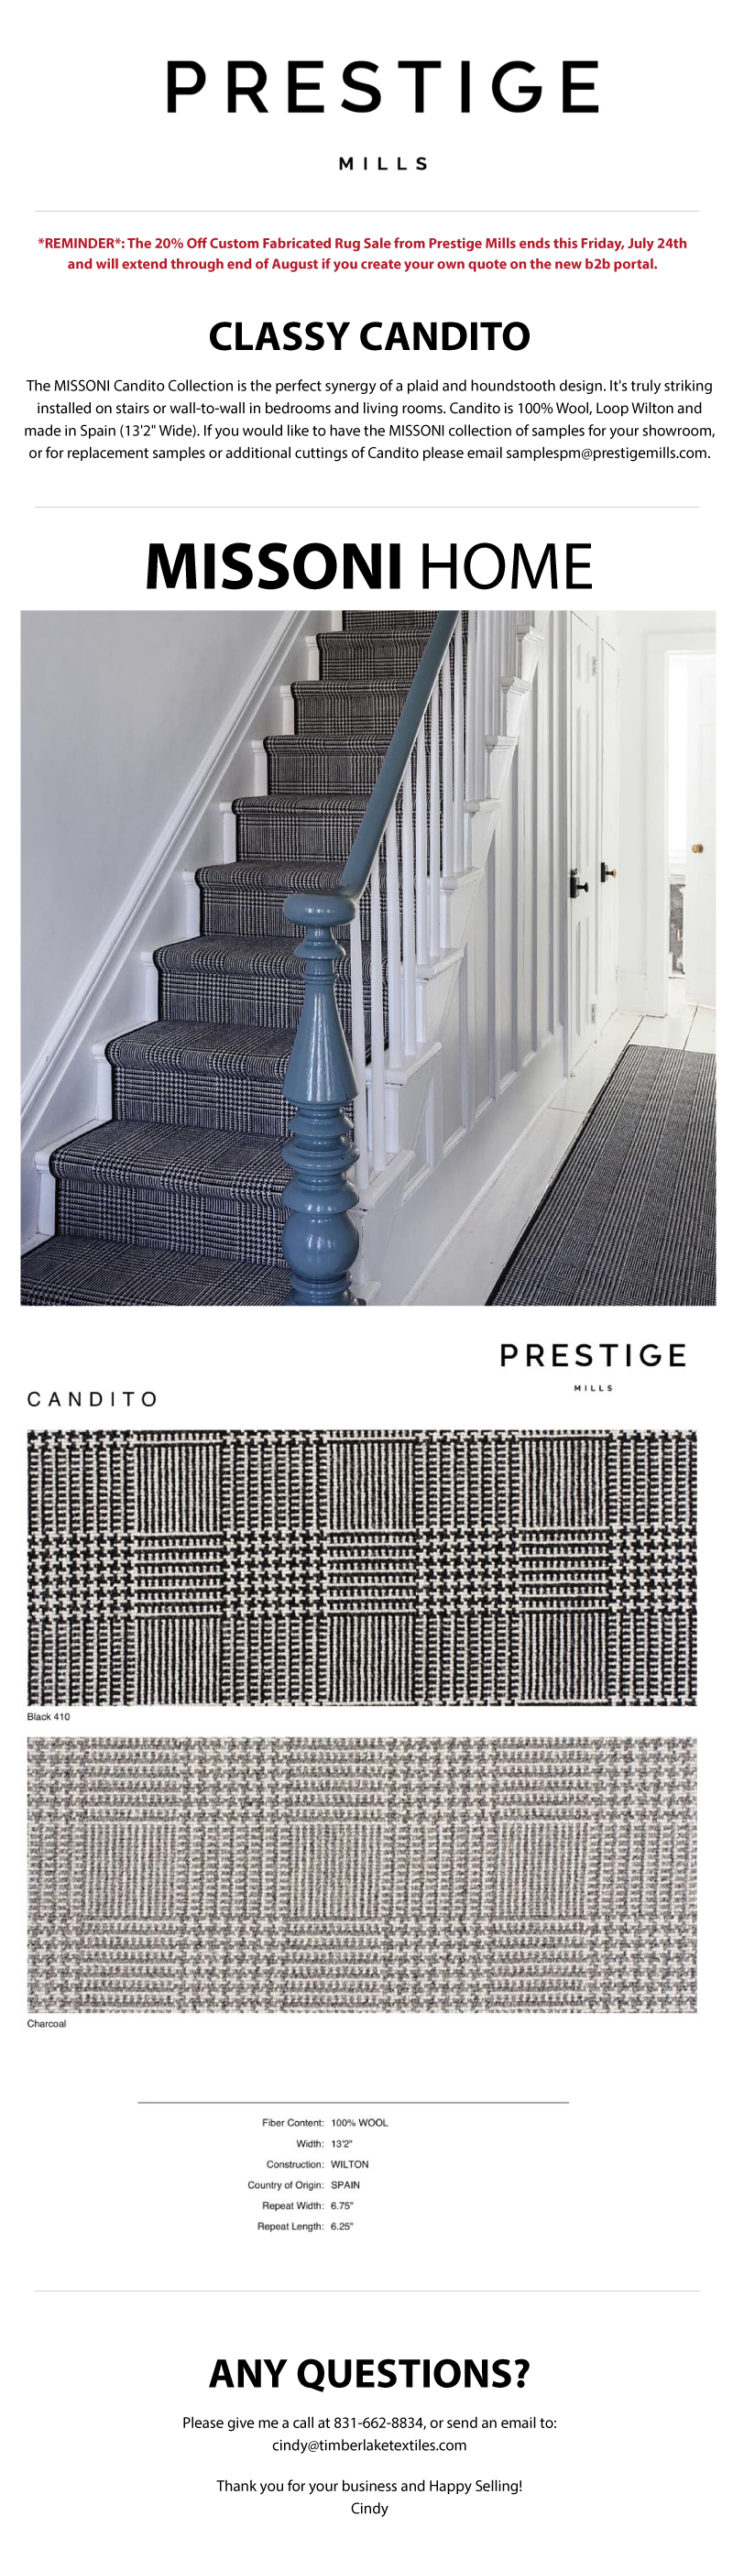 Prestige Mills | Missoni Highlight: Candito